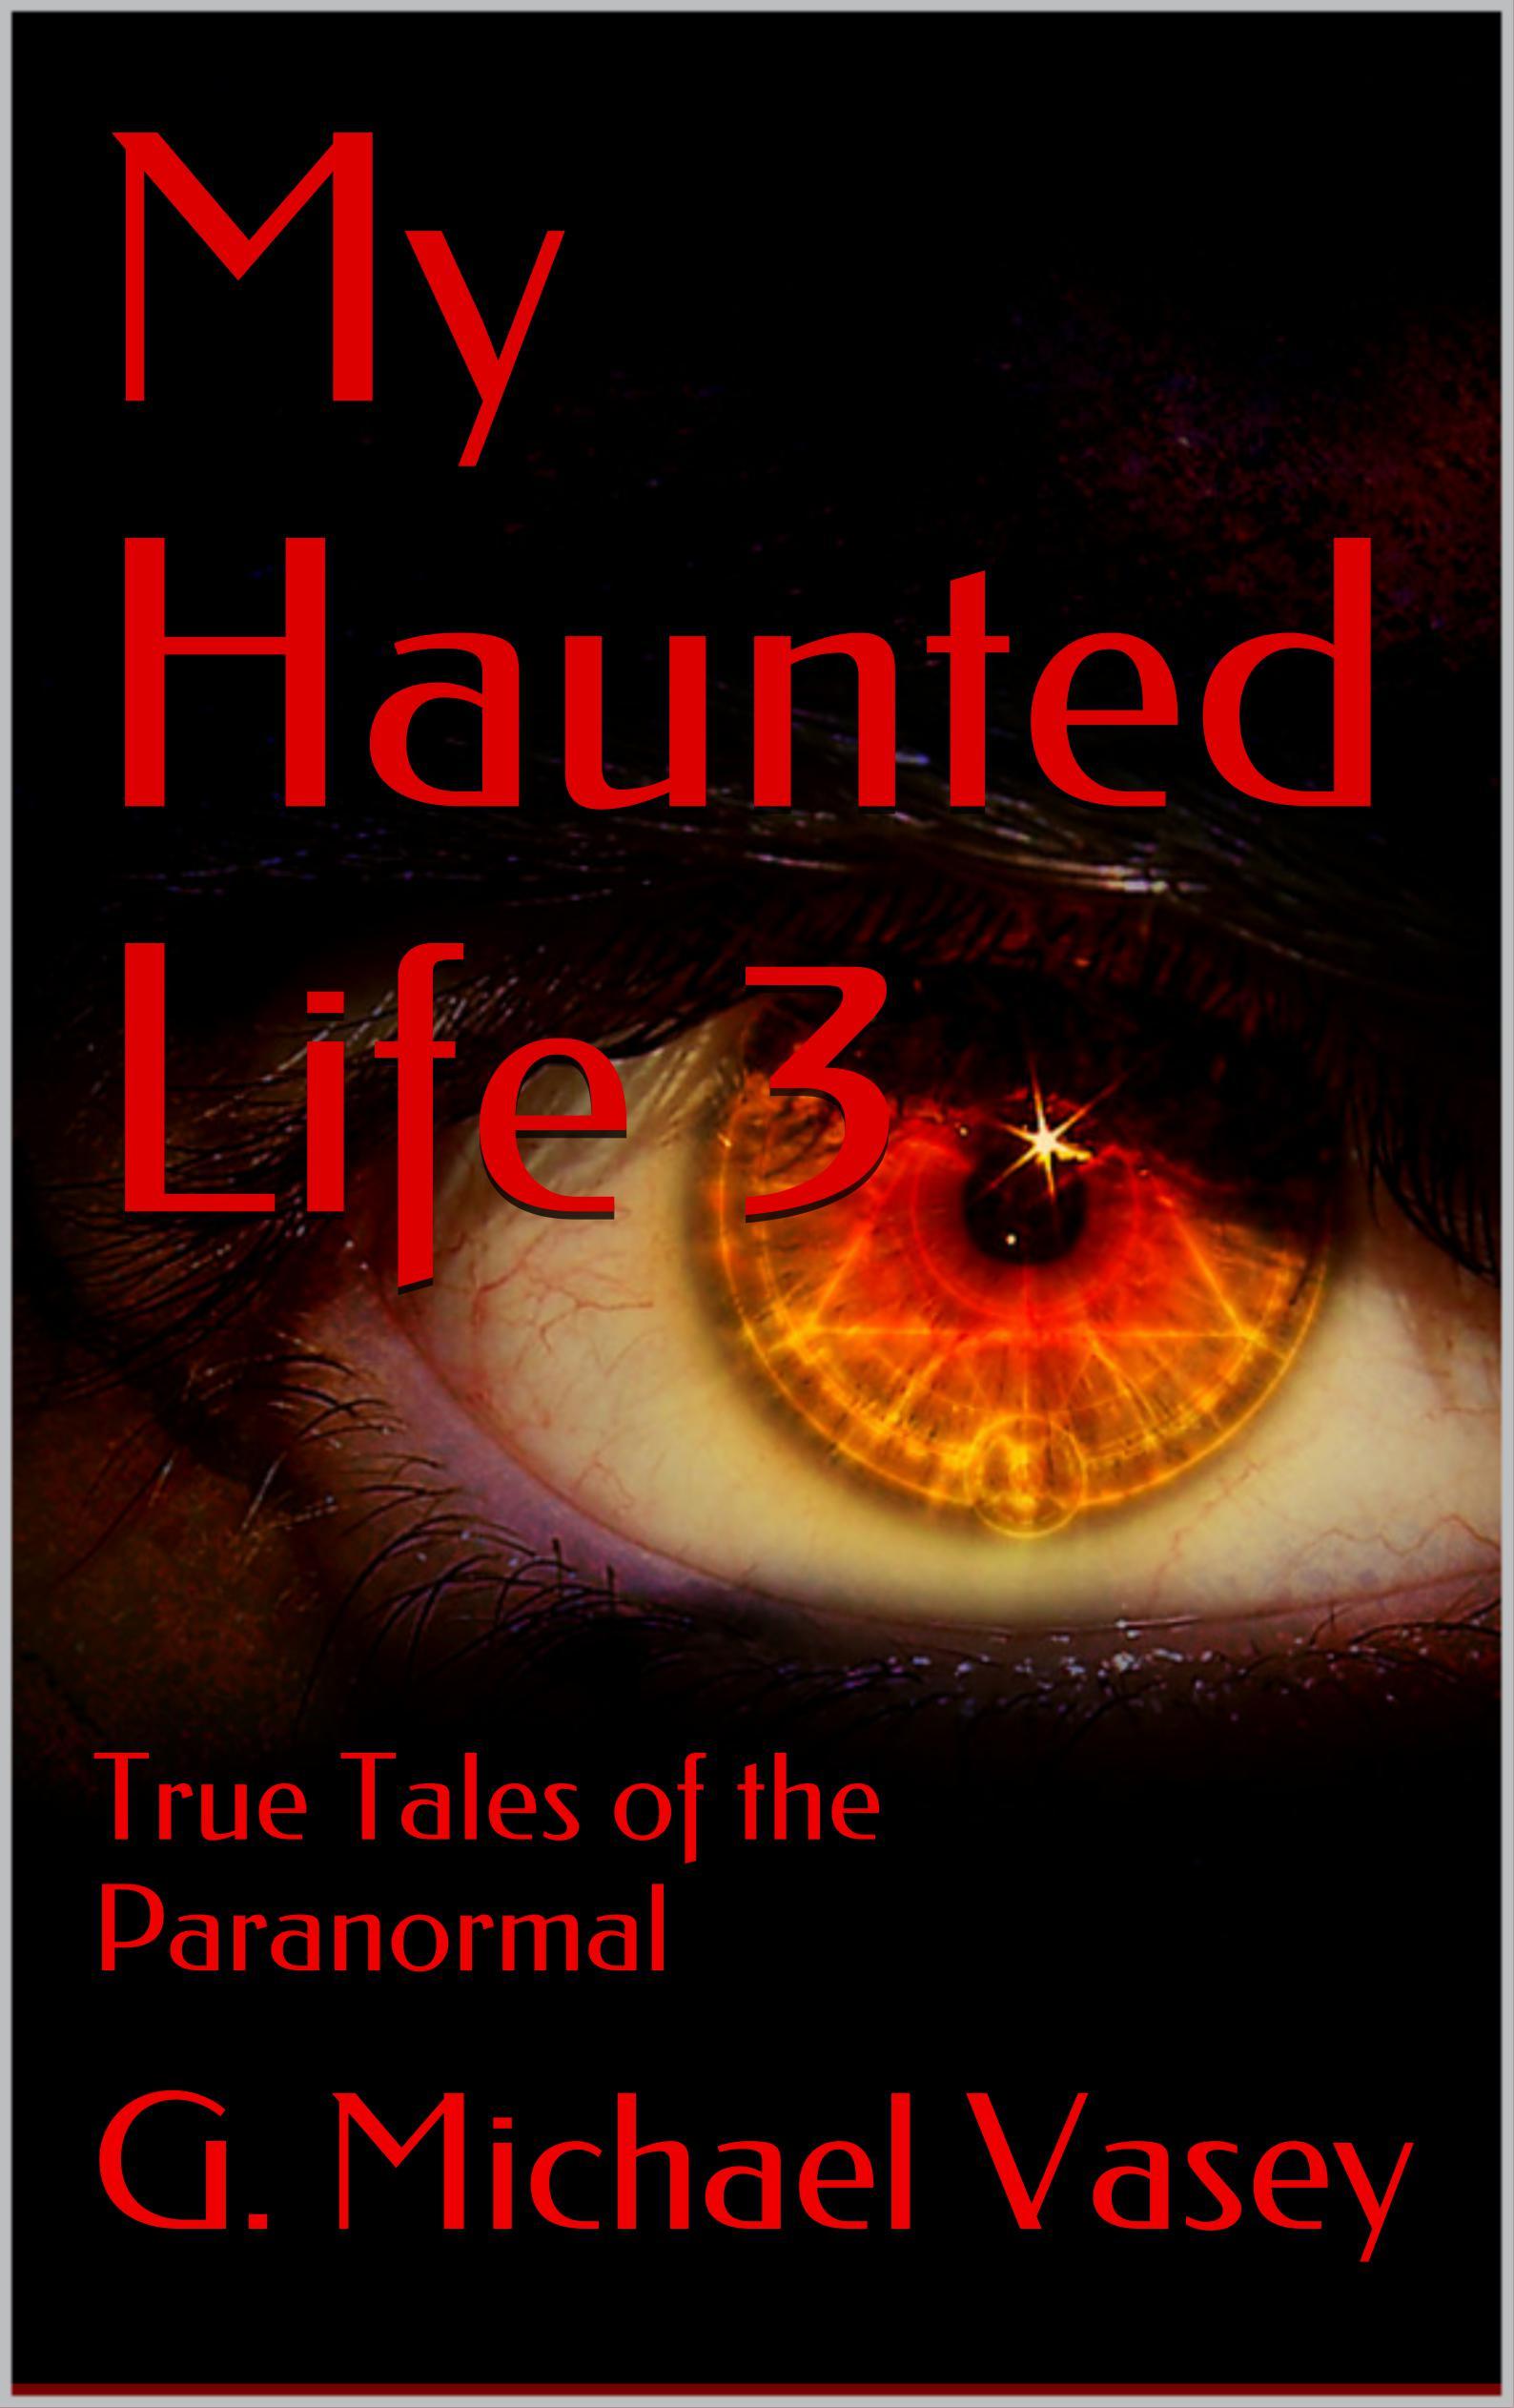 My Haunted Life 3